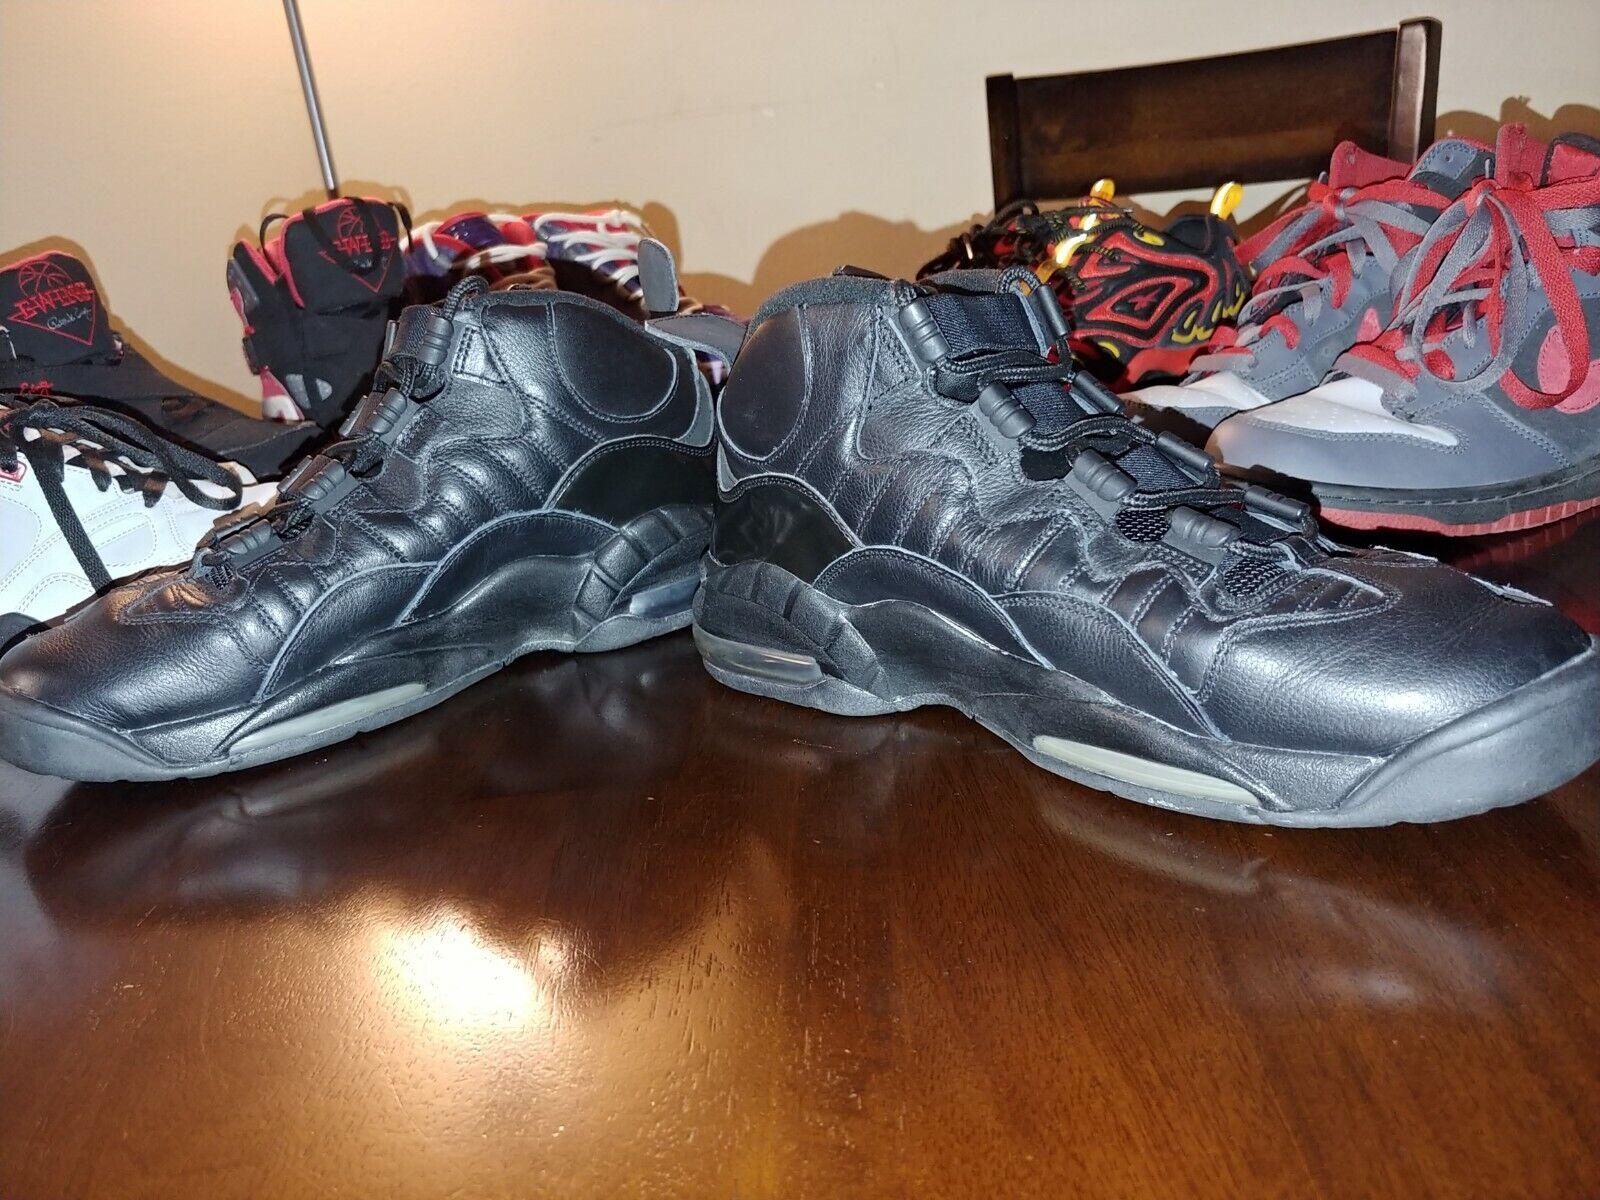 f5f50ad5d5 ... Nike airmax airmax airmax Chris webber size 10.5 black mid top shoes  2007 rare 315863- ...